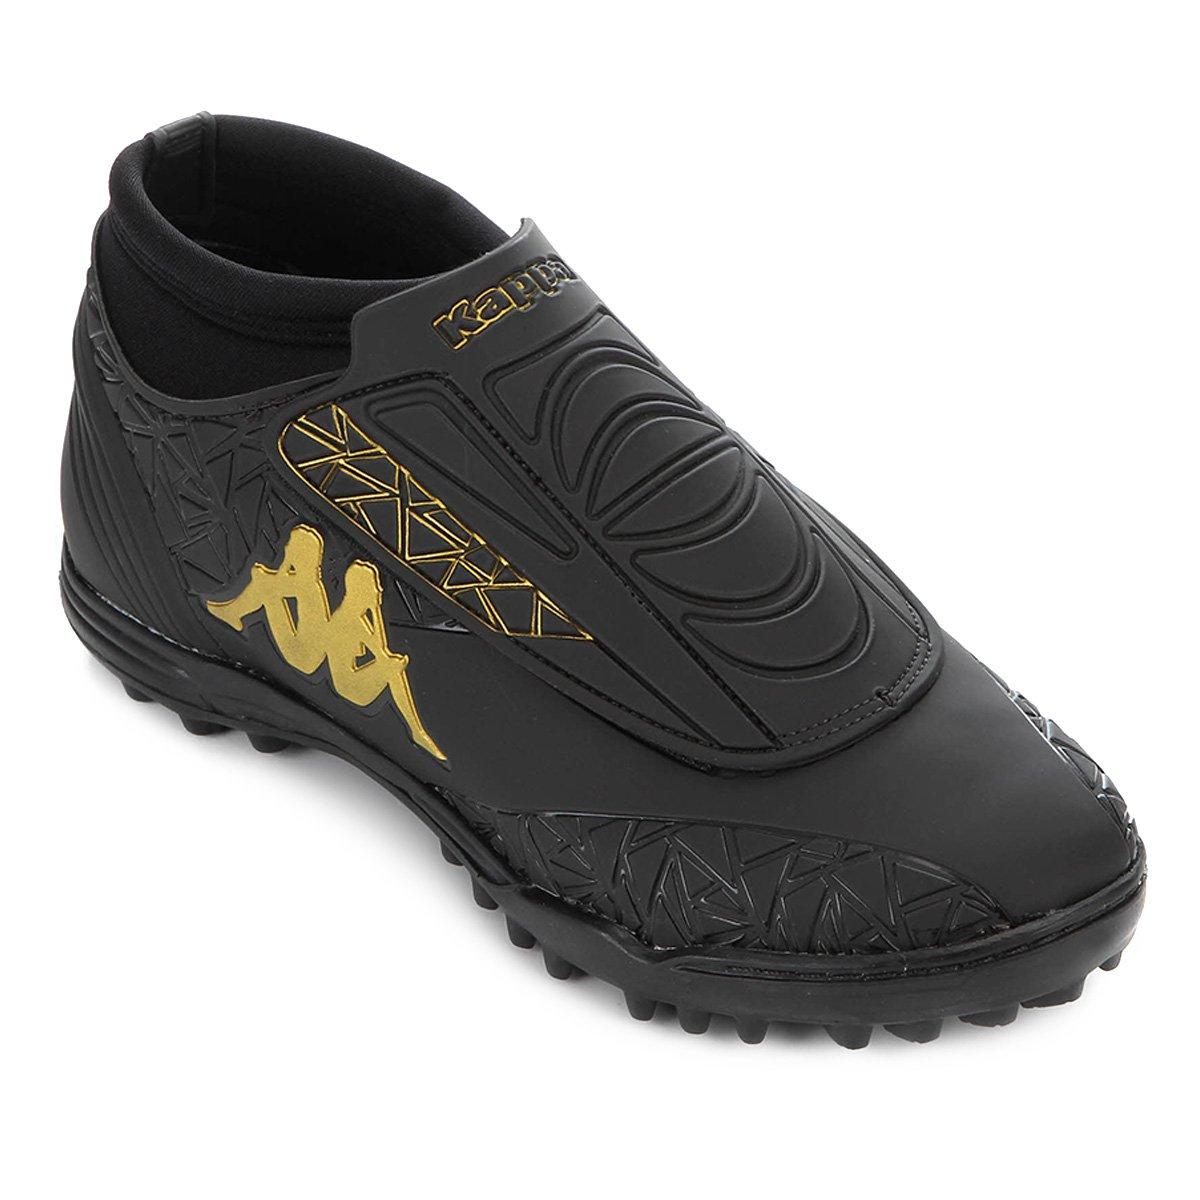 782045e2ad FornecedorNetshoes. Chuteira Society Kappa Force